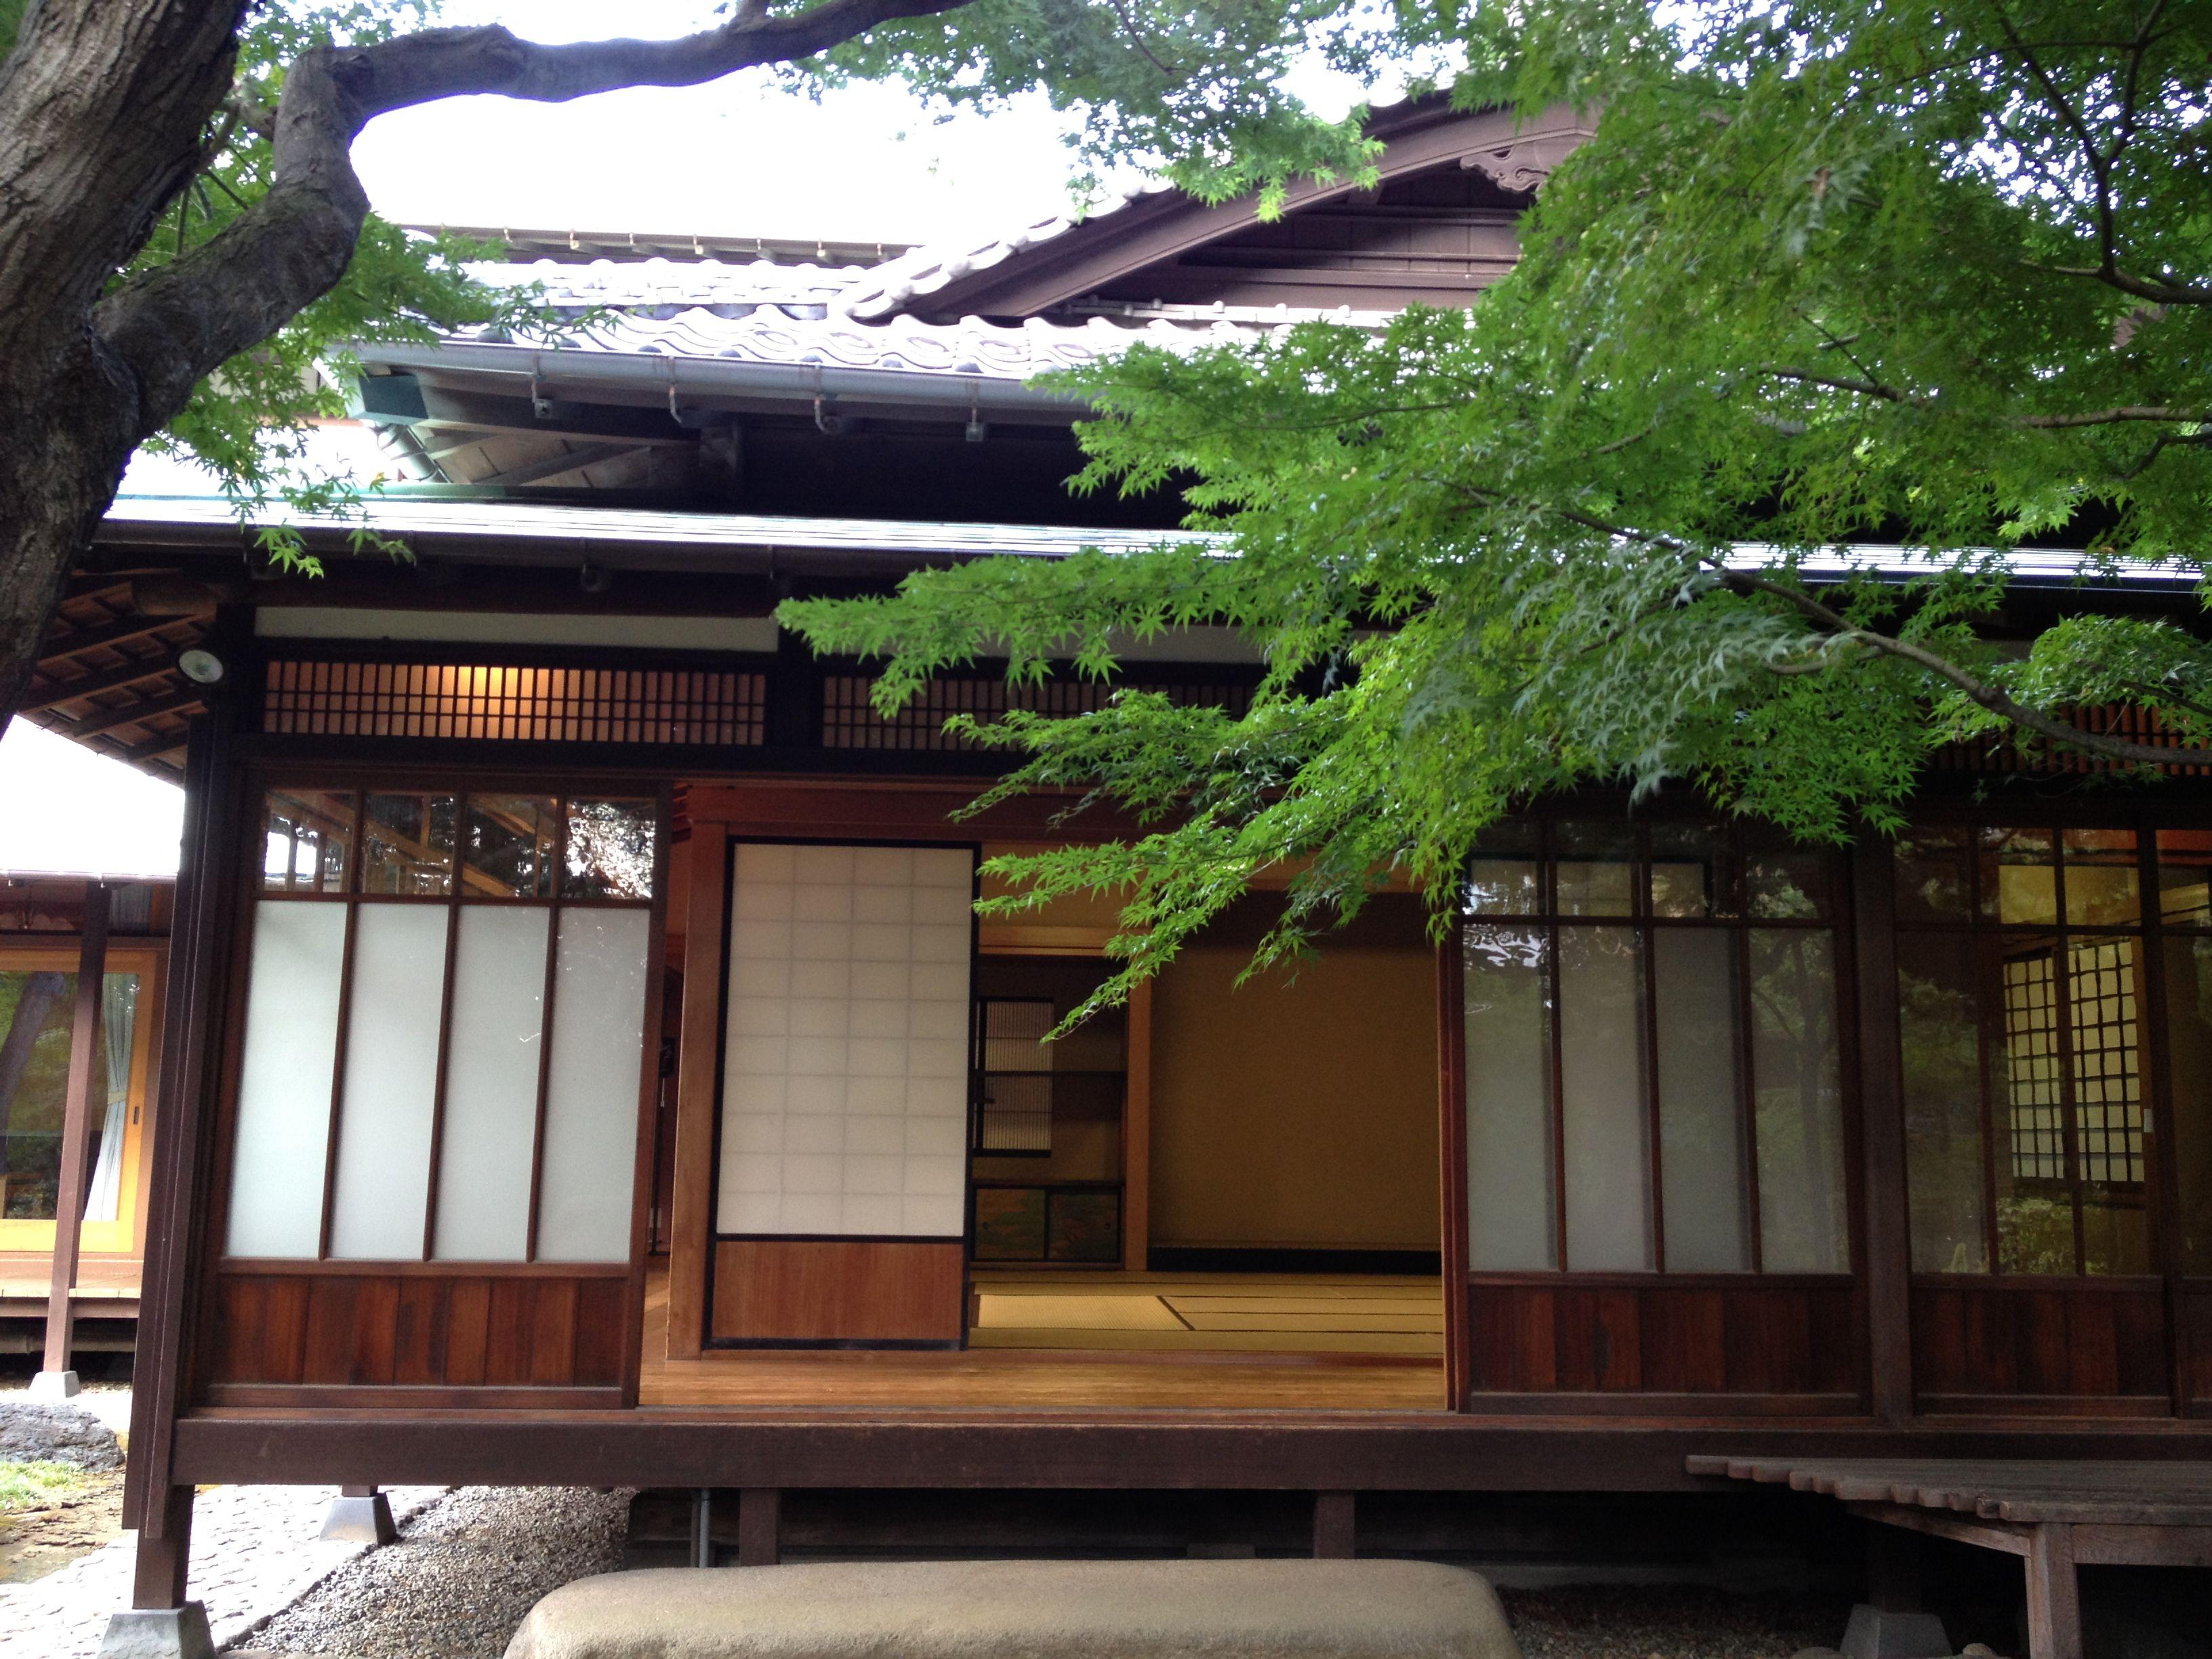 Asakura's house in Daikanyama.